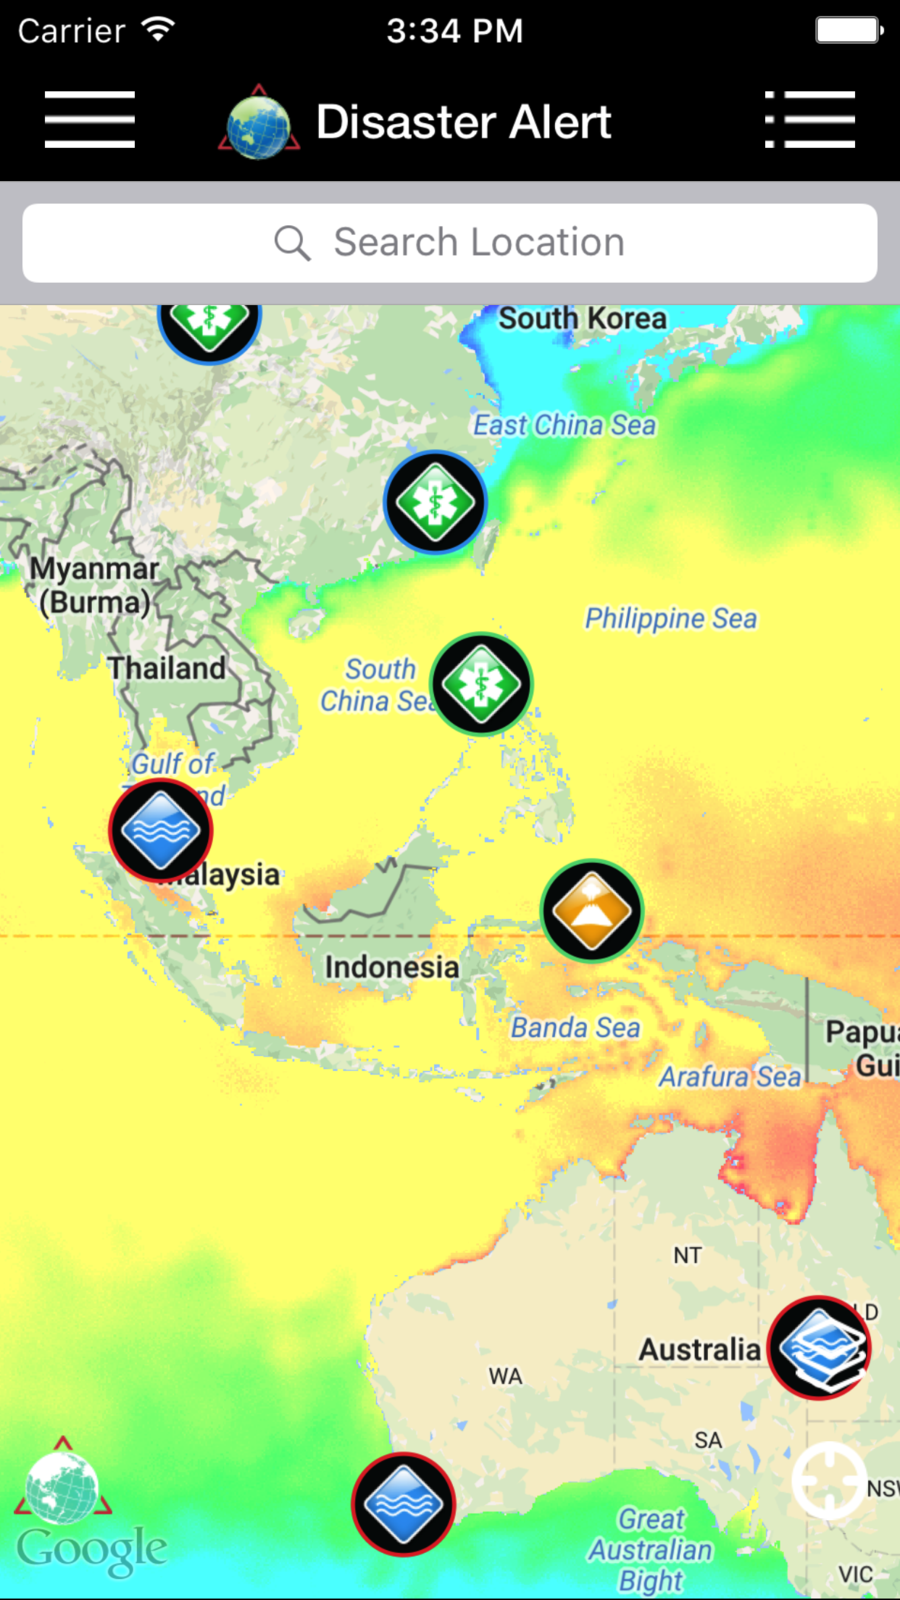 Disaster Alert (PDC World Hazards) CenterPacificNews